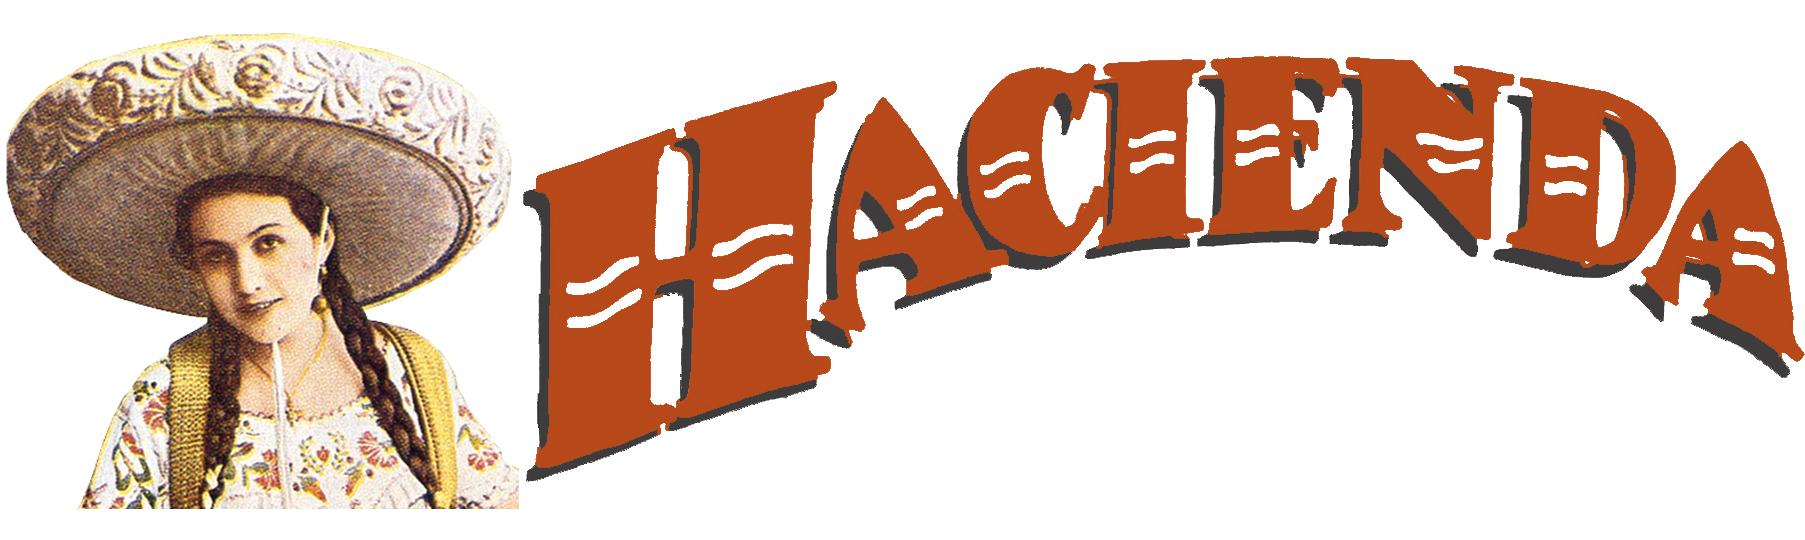 ninia sola hacienda orange 3